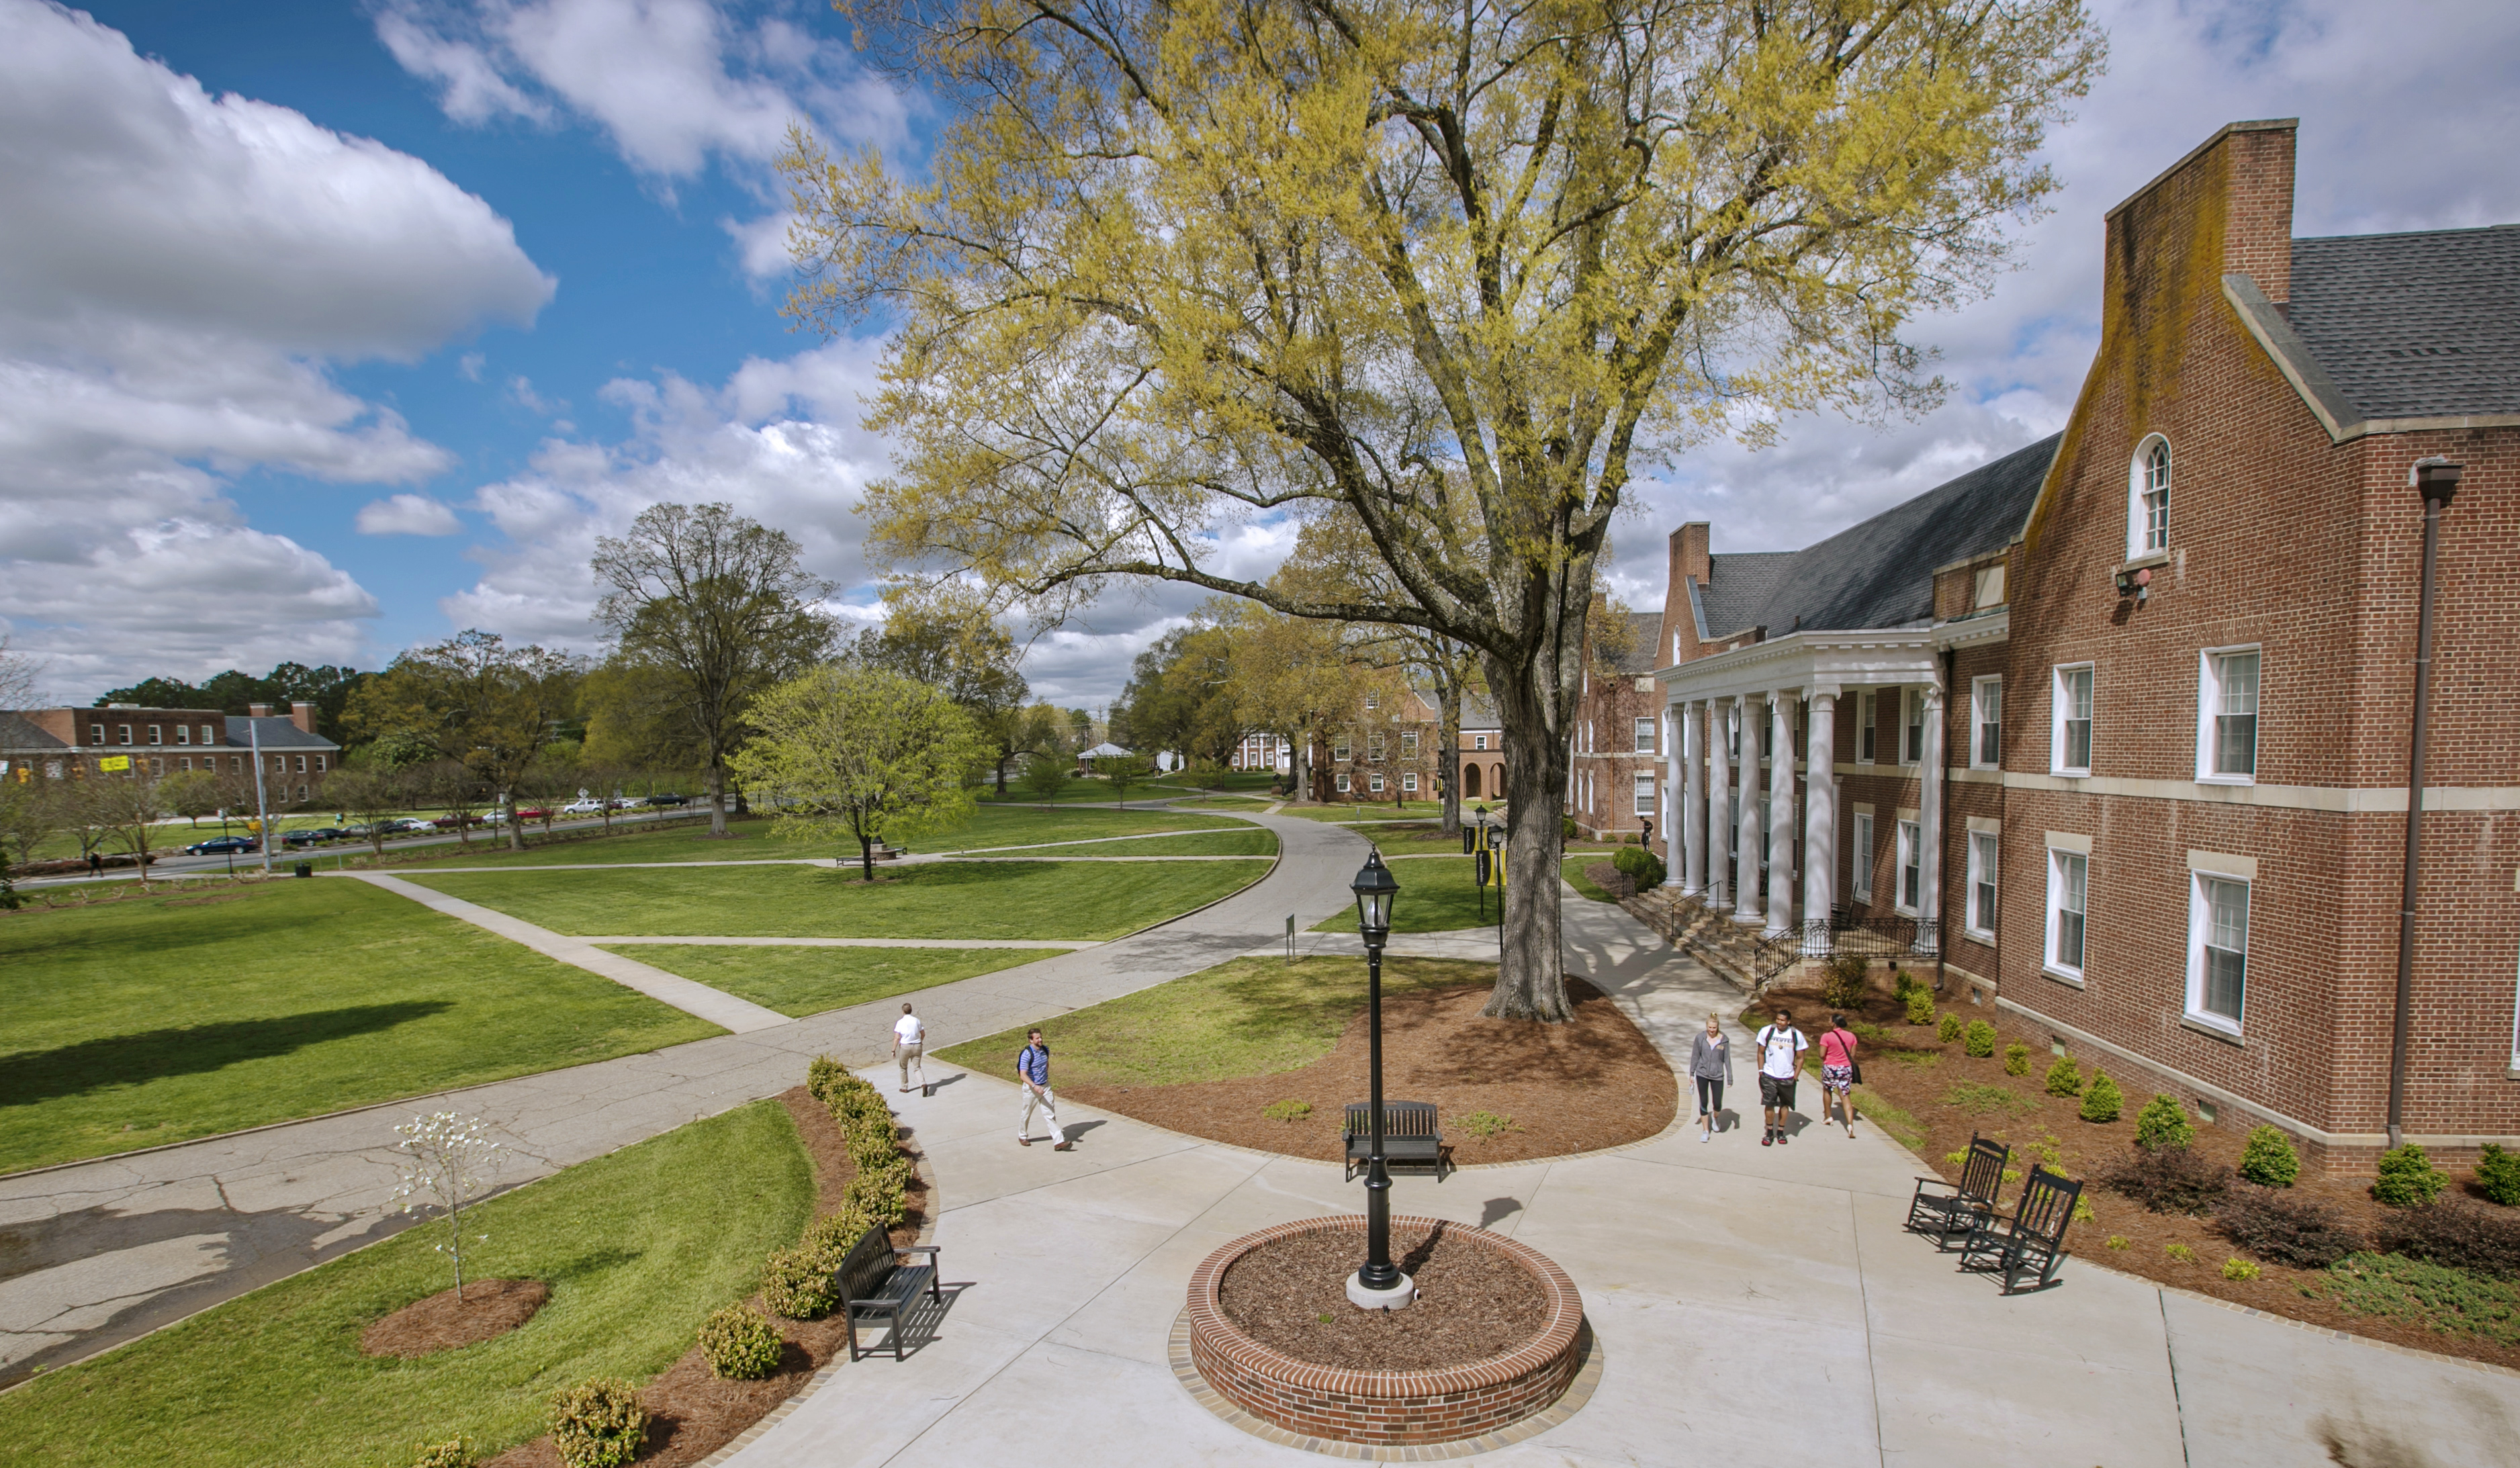 Fall 2020 Academic Calendar Updates | Pfeiffer With Regard To Ga State University Academic Calendar 2020